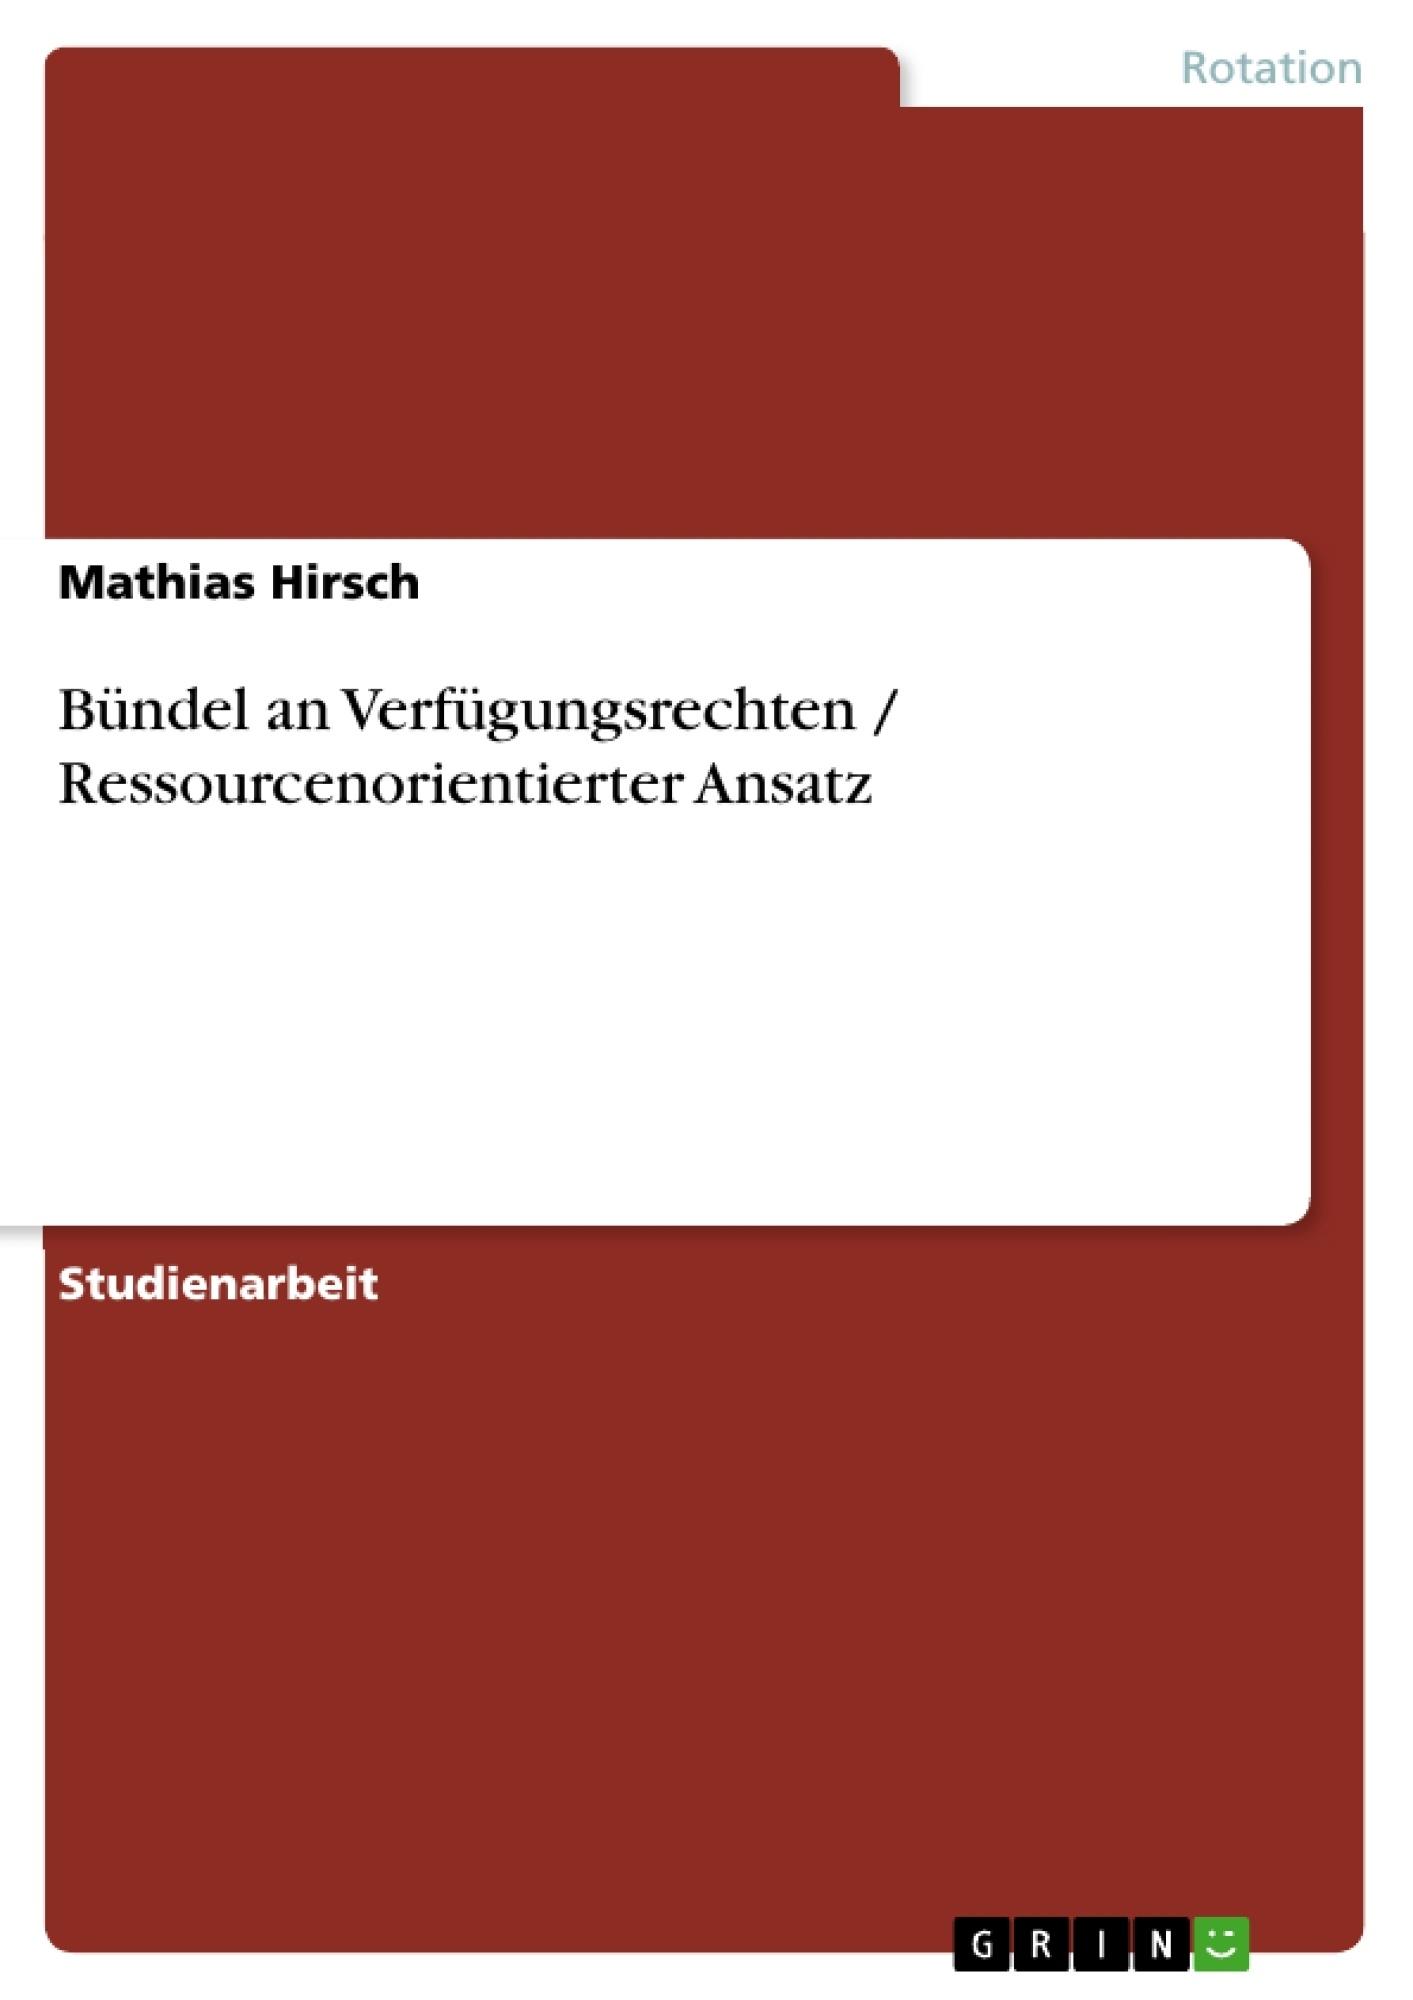 Titel: Bündel an Verfügungsrechten / Ressourcenorientierter Ansatz